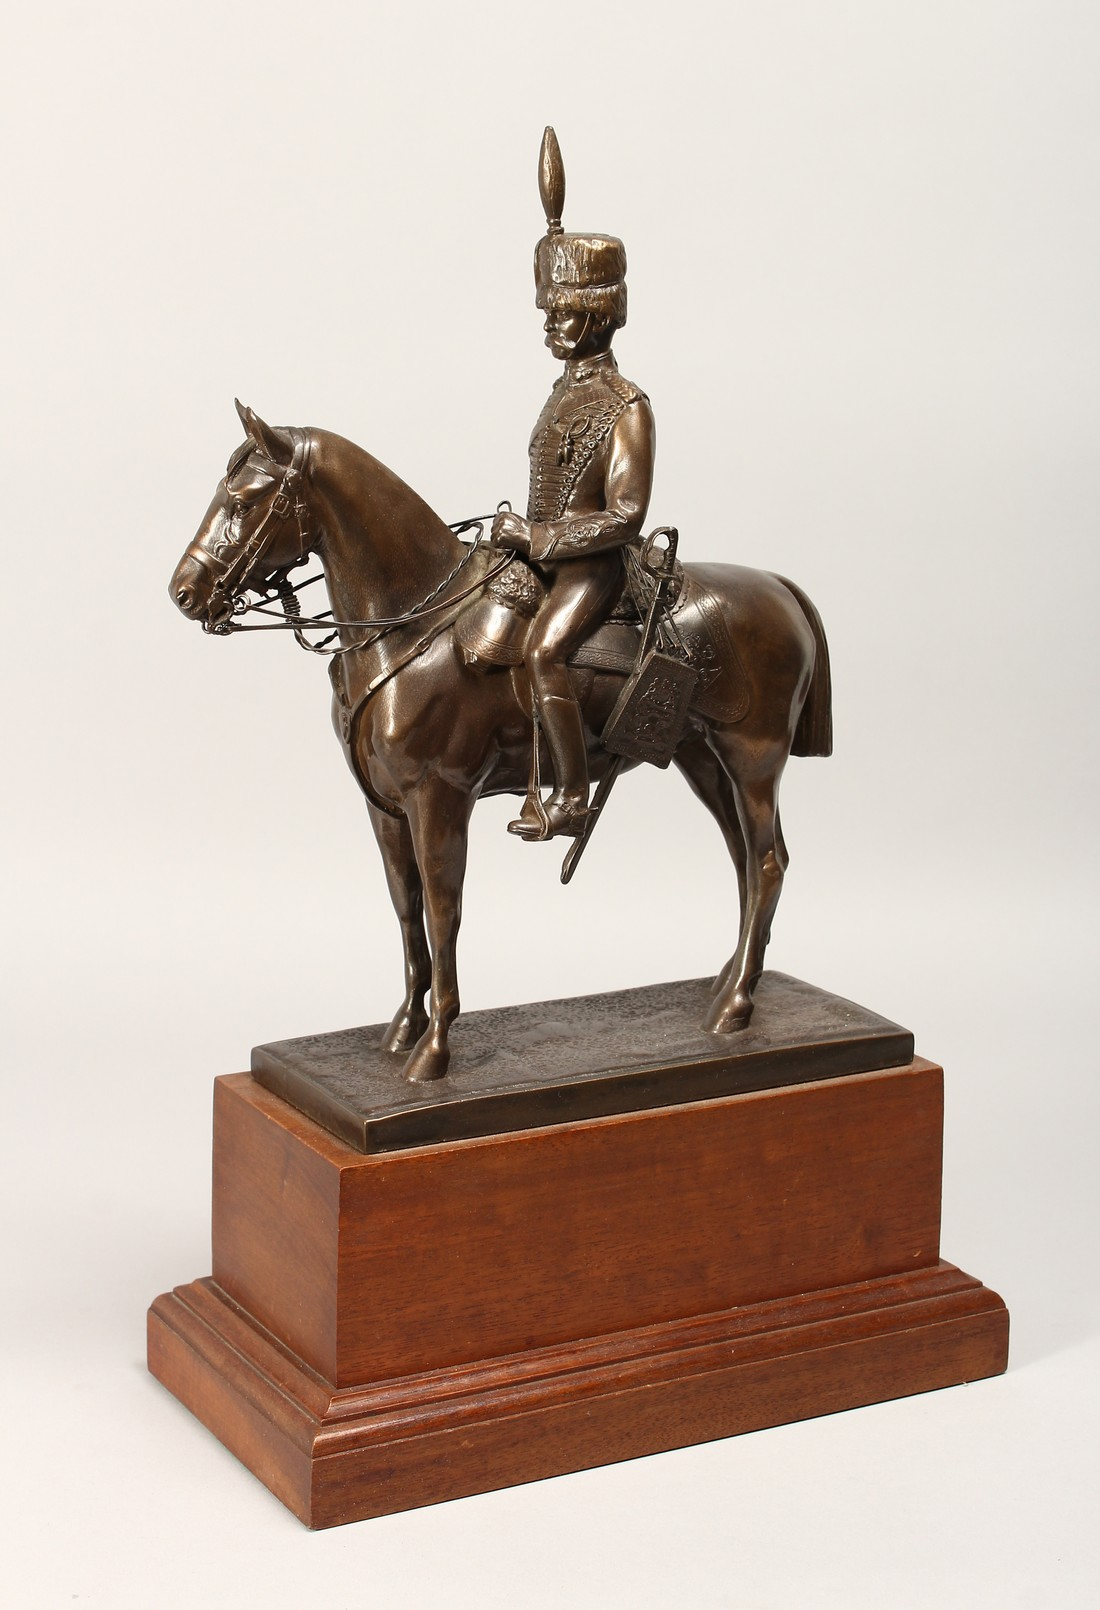 A BRONZE OVERLAID COMPOSITE MODEL OF A HUSSAR ON HORSEBACK, on a wooden plinth base 17ins high.